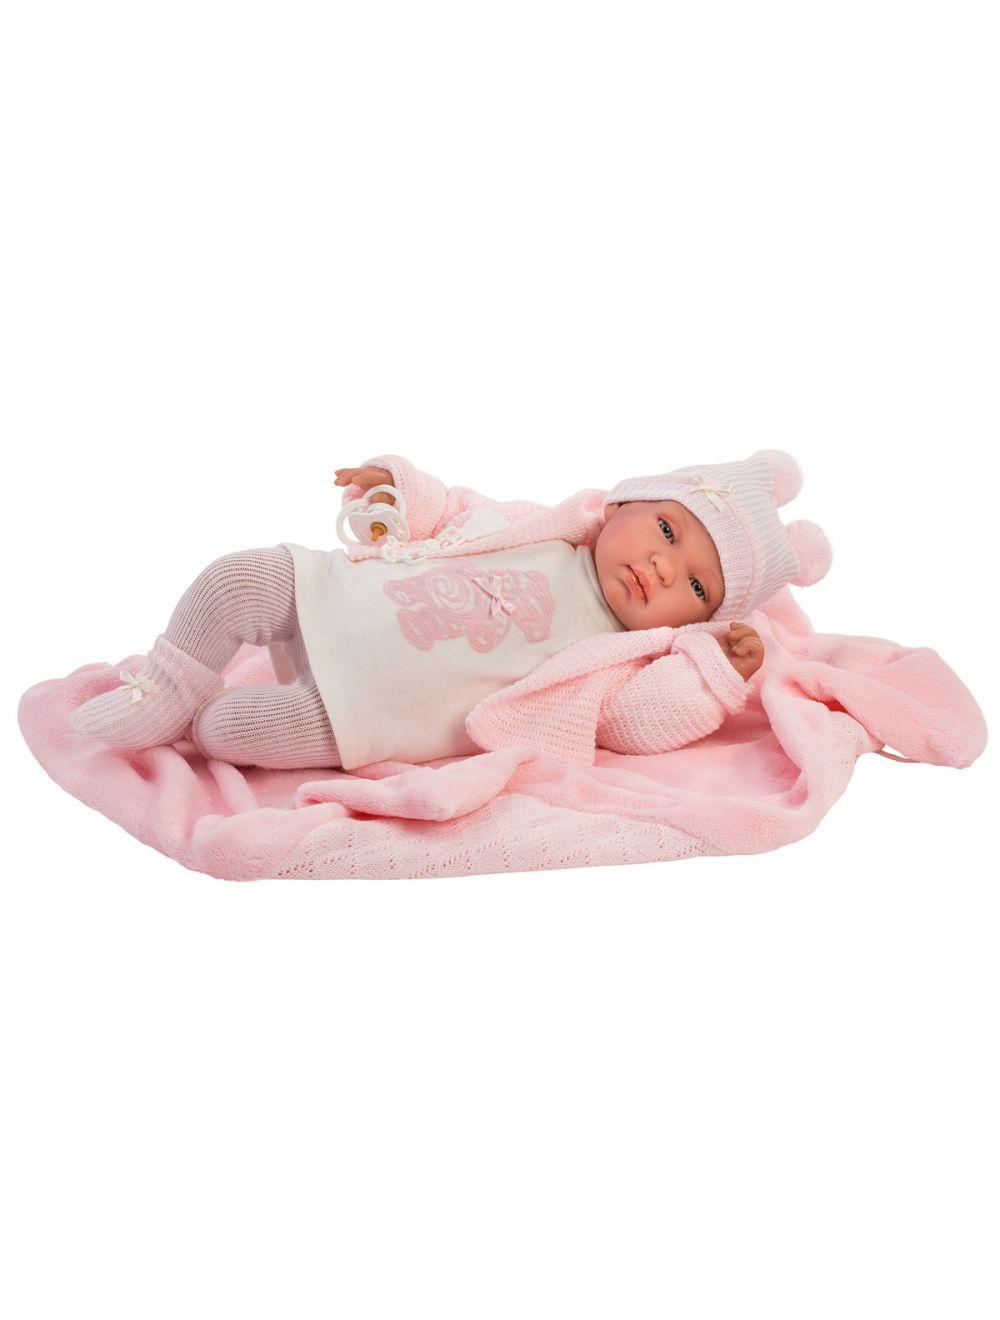 Llorens 84428 Lalka płacząca bobas Tina 43 cm body różowy miś